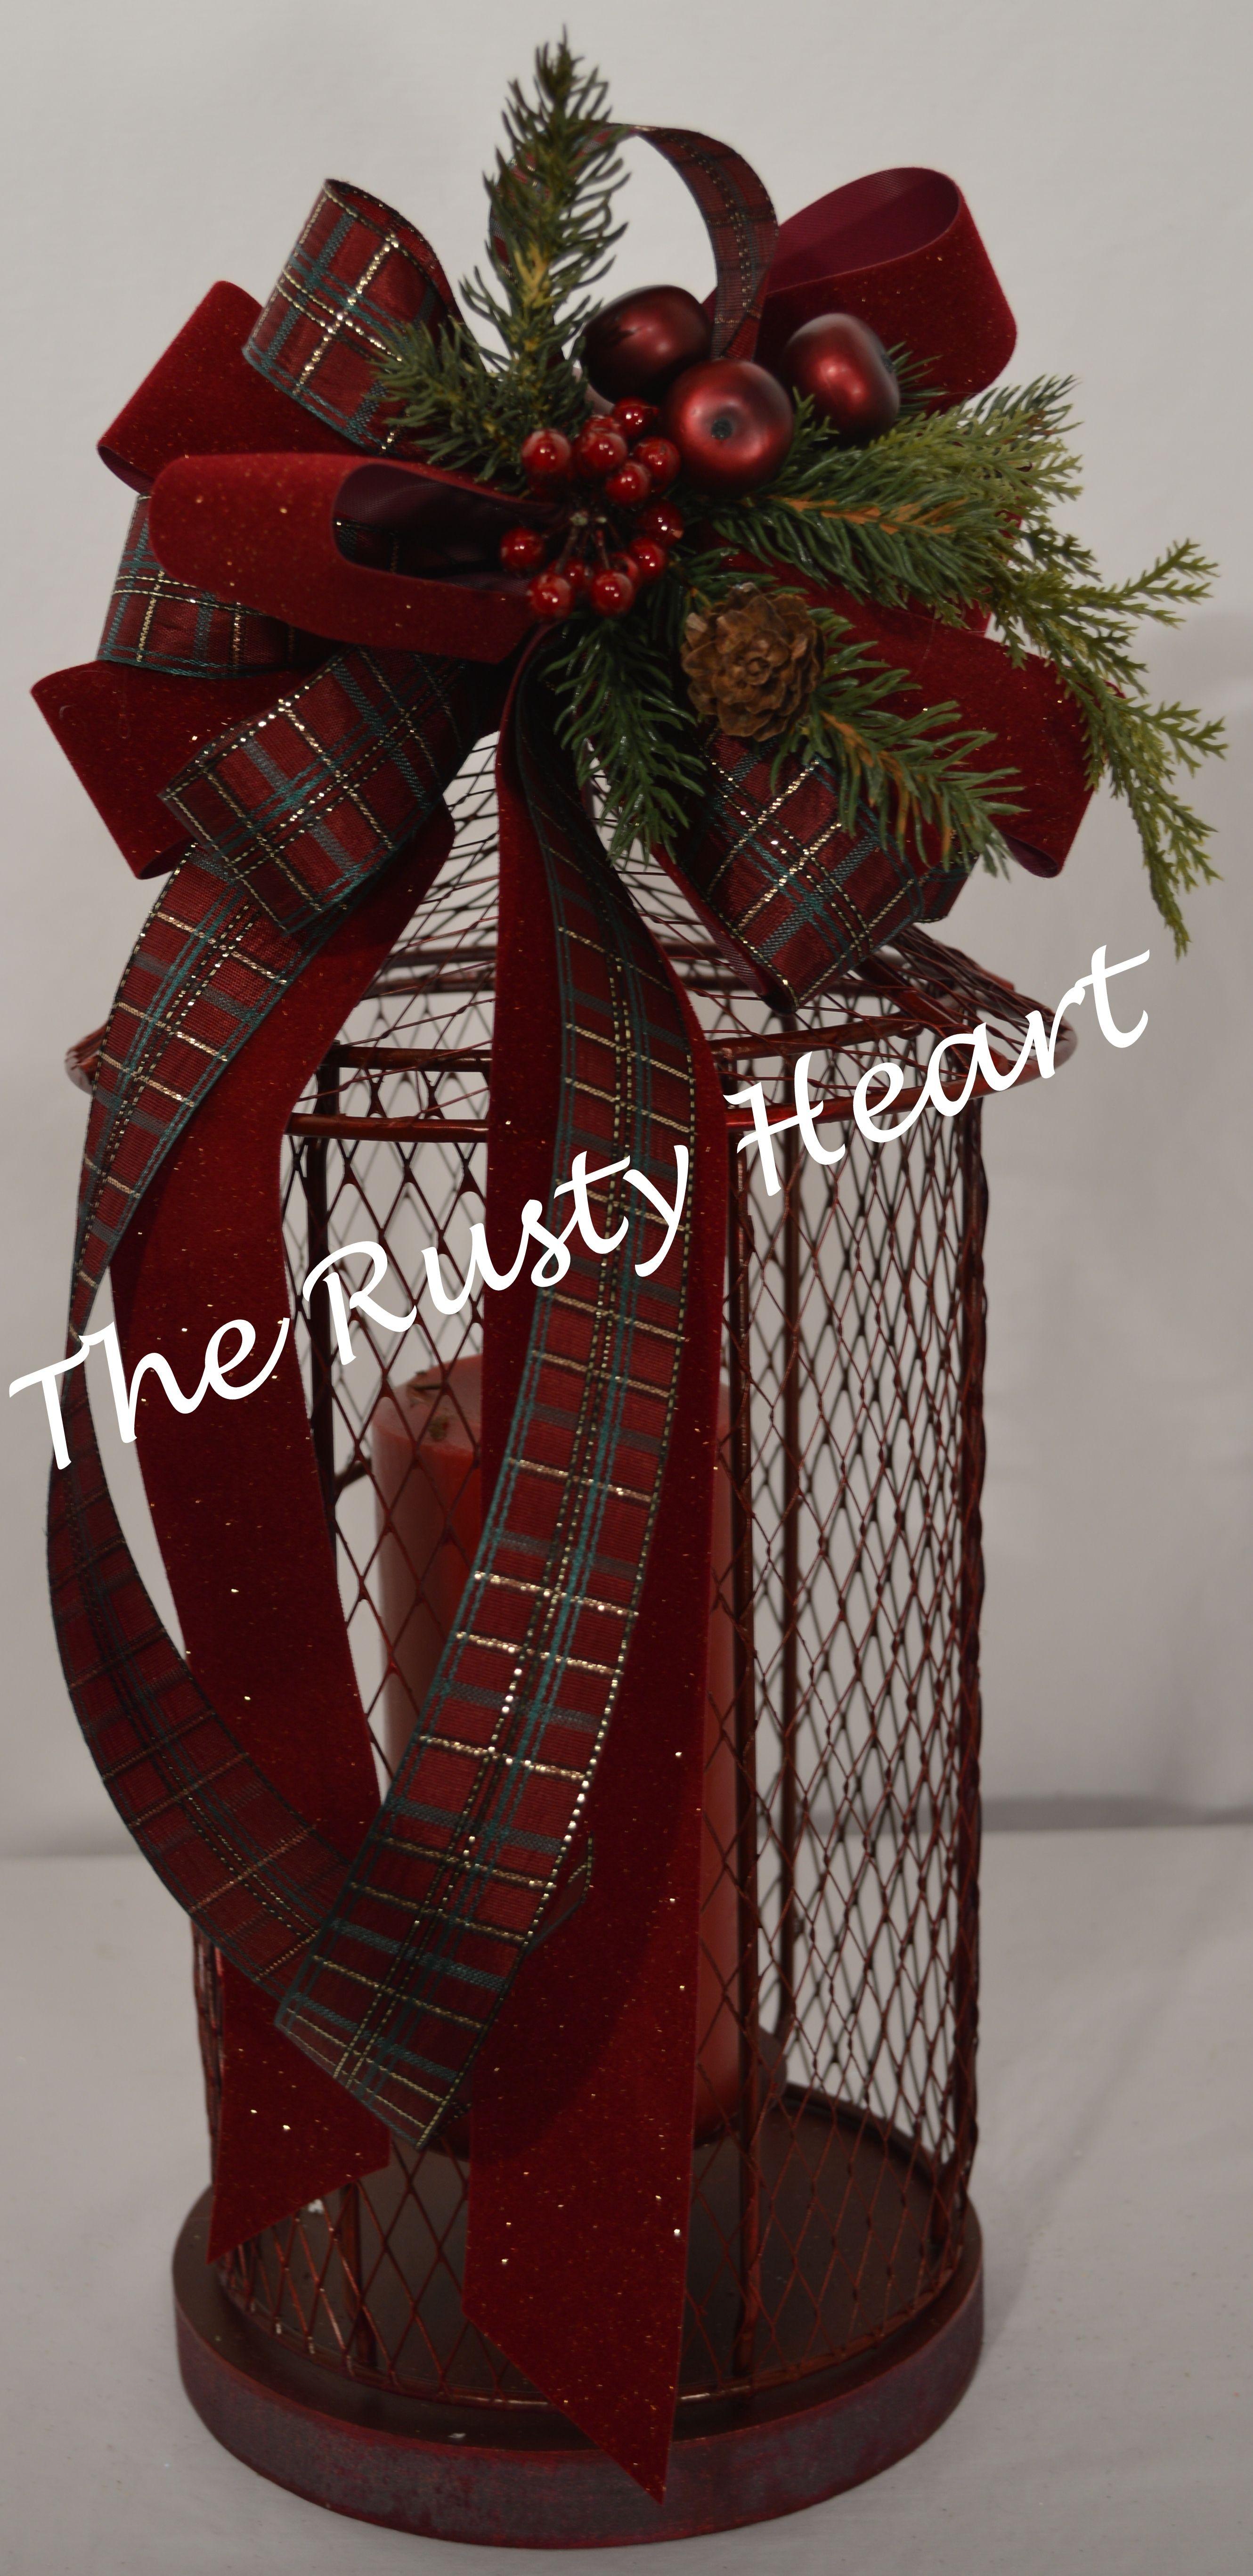 Decorated mesh lantern decorating for christmas for Images of lanterns decorated for christmas